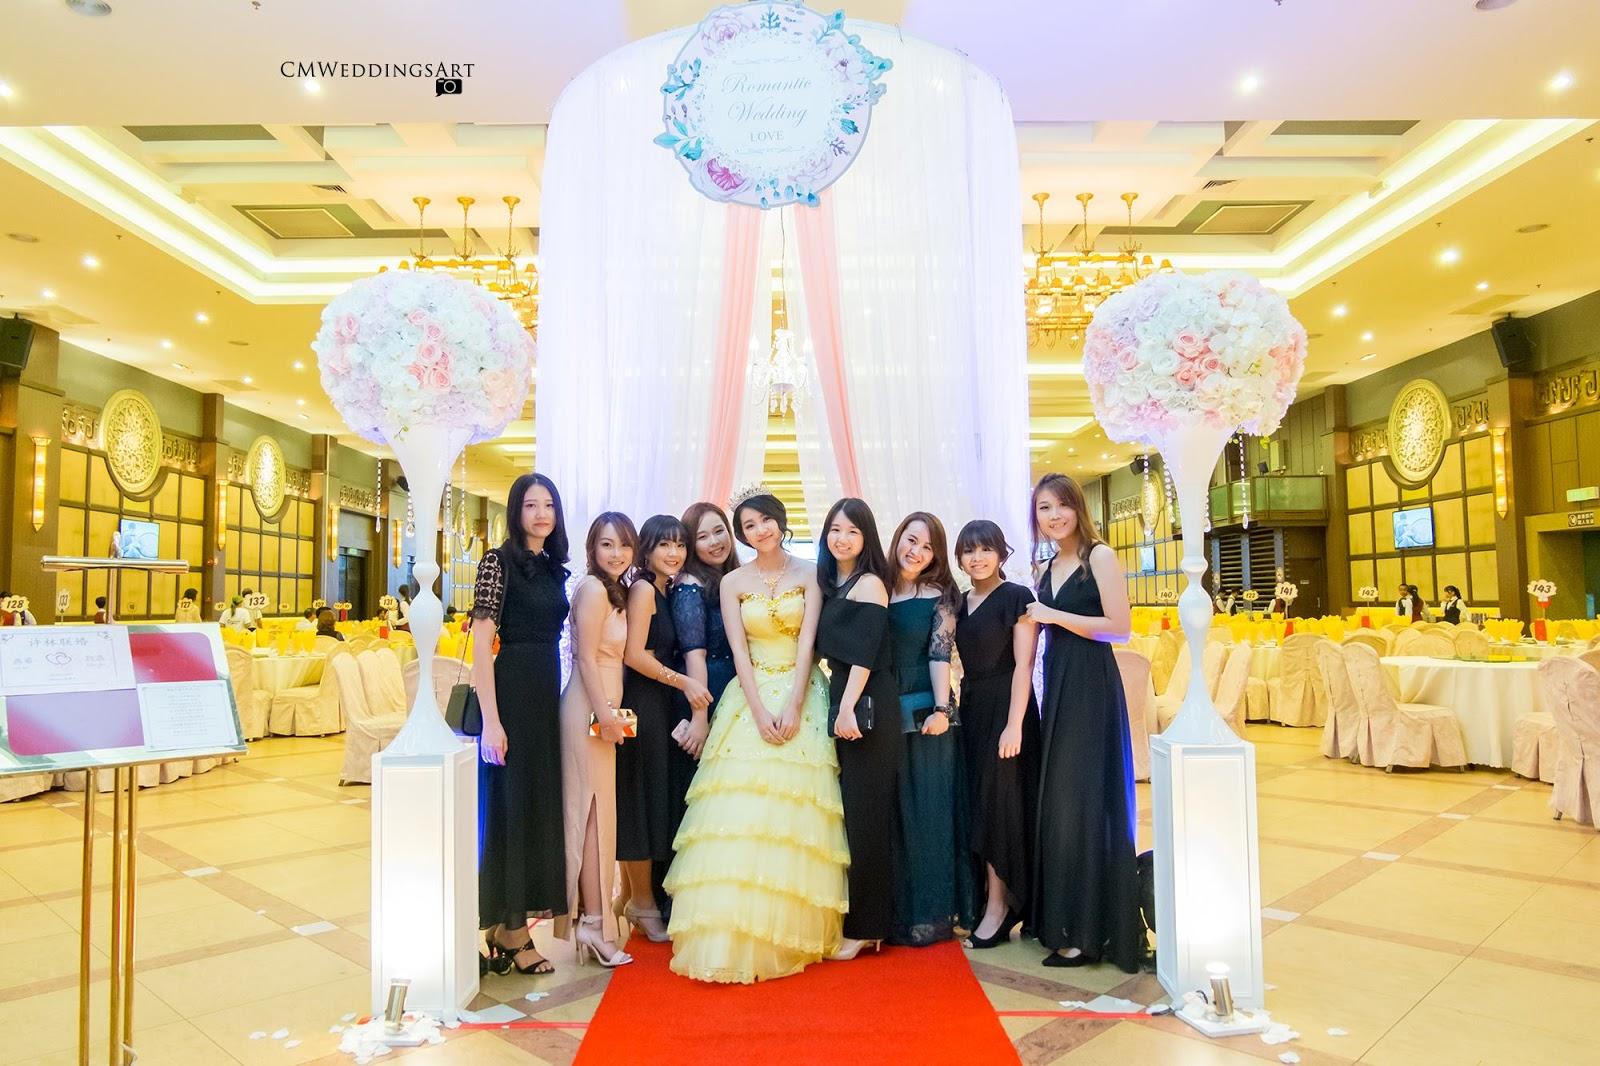 Wedding Decorations Ideas With Gazebo Chuppah And Teepe